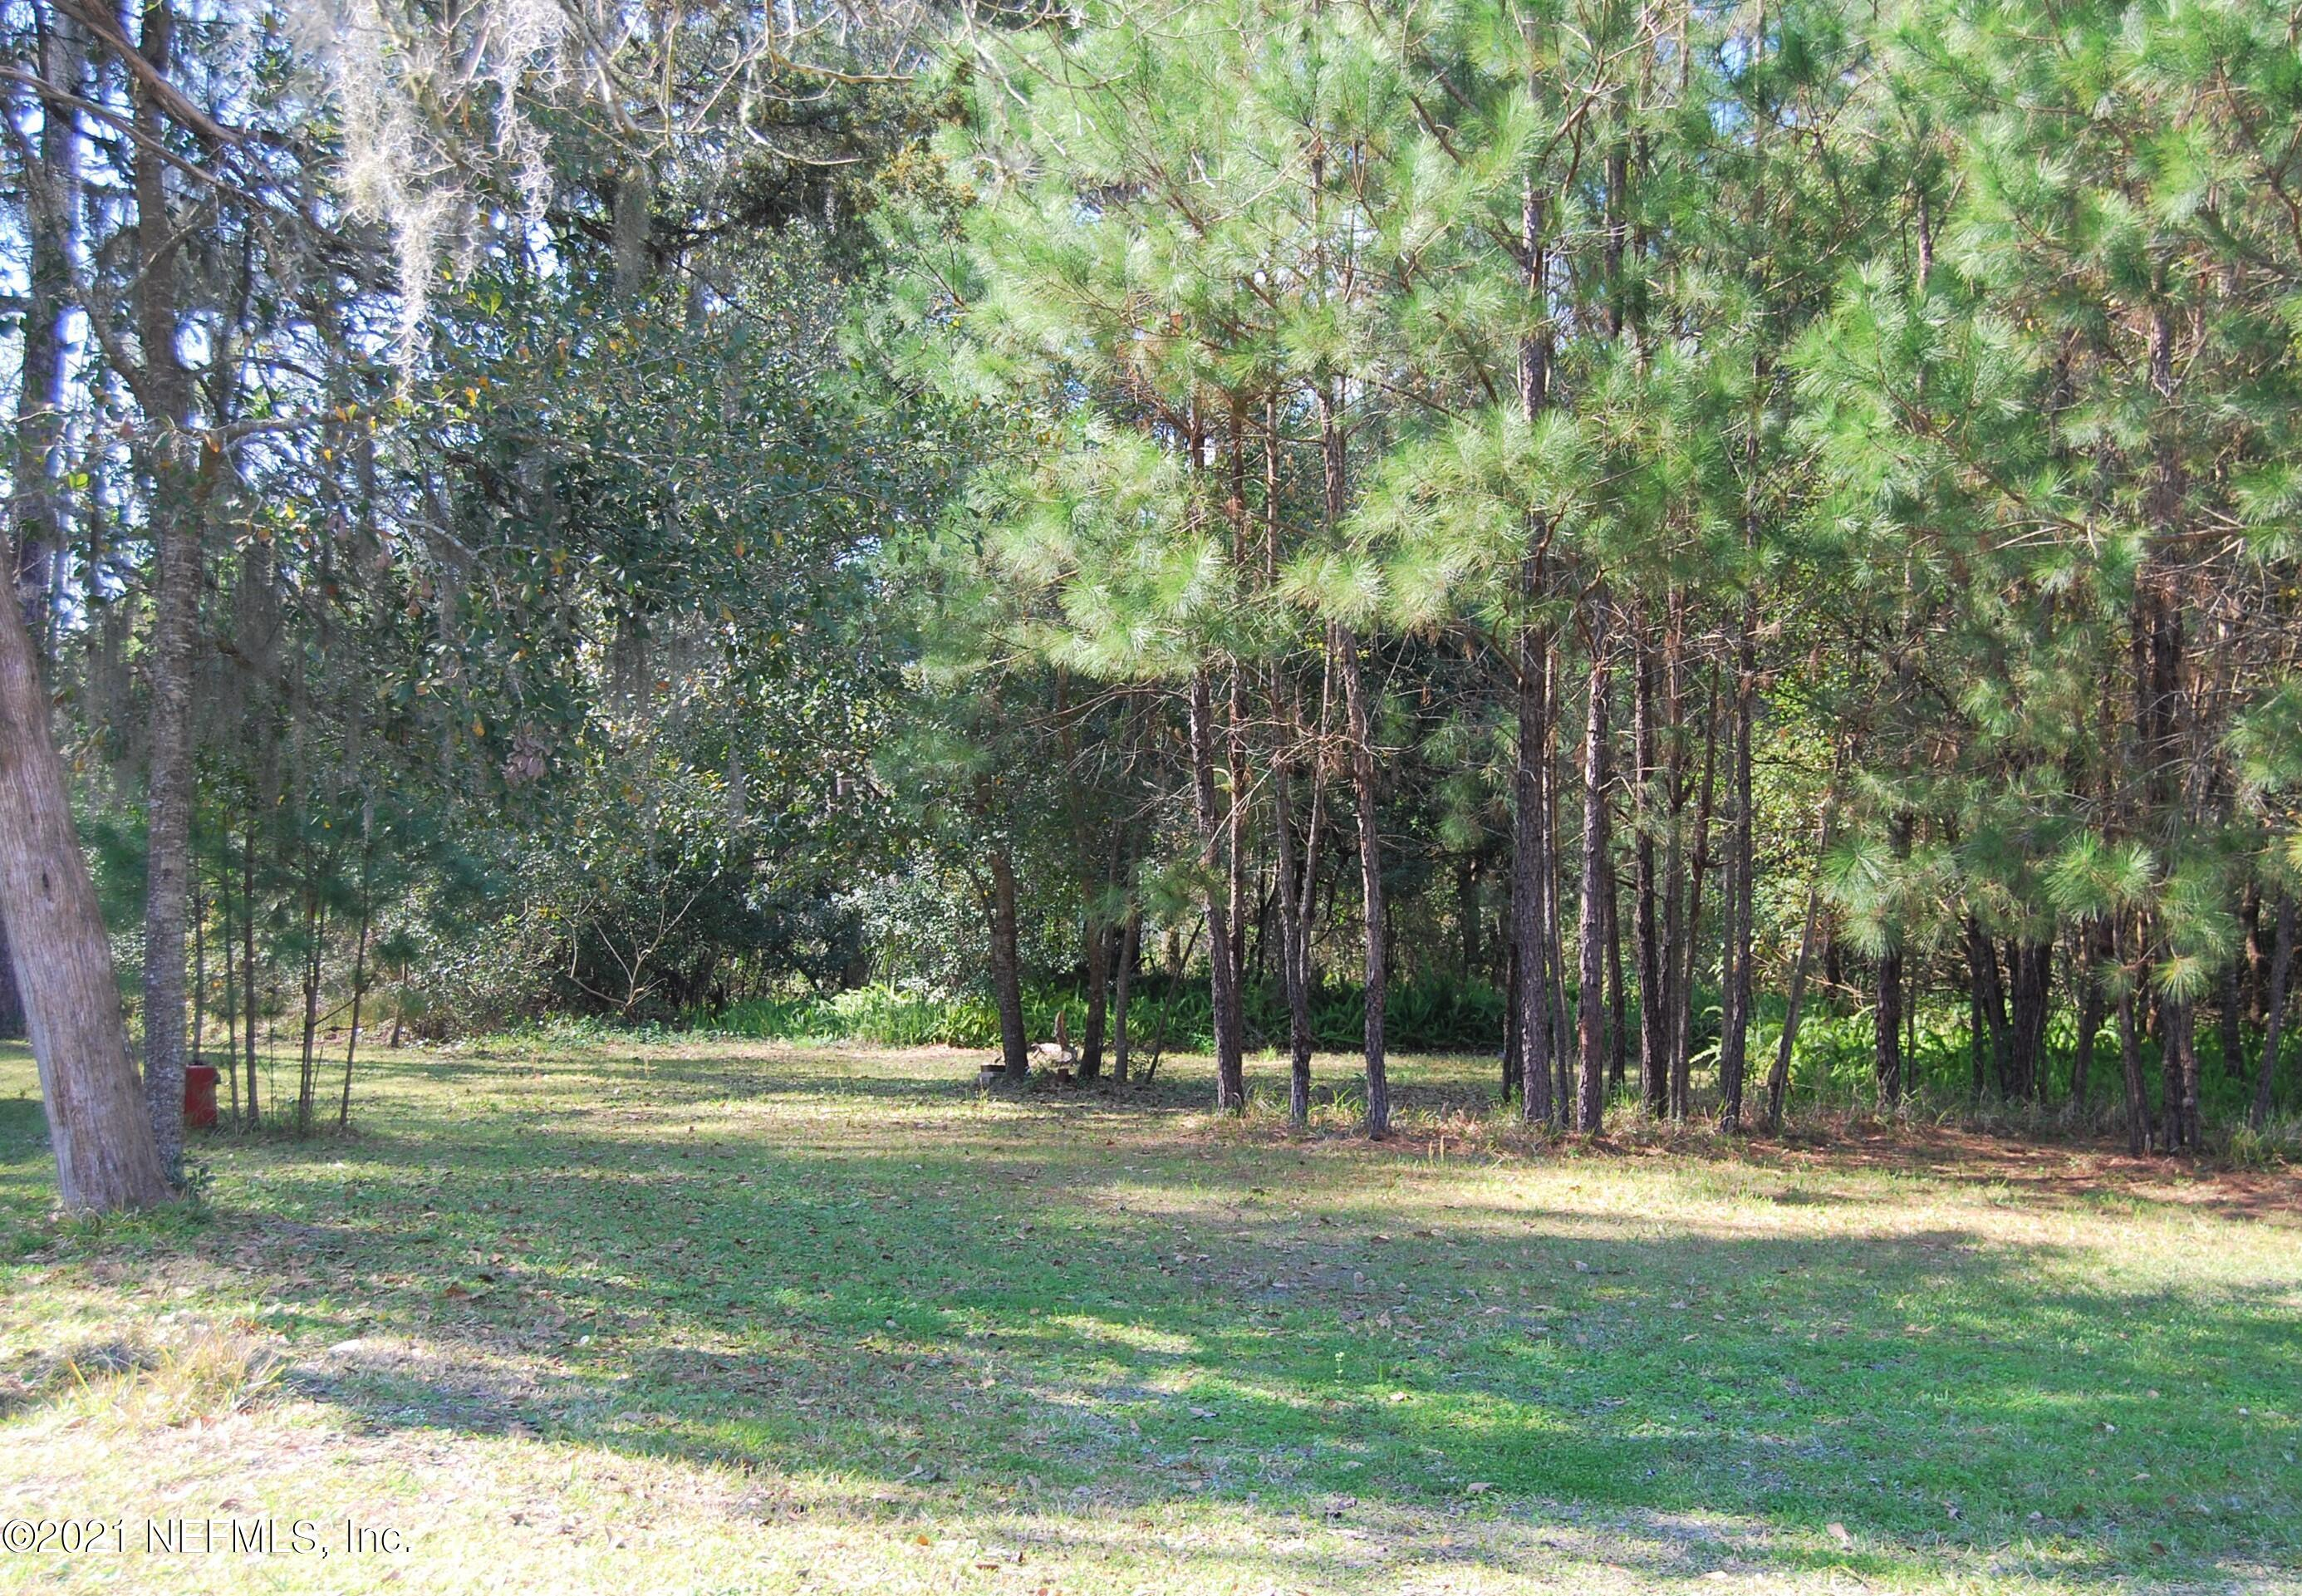 0 BENLOCKE, JACKSONVILLE, FLORIDA 32210, ,Vacant land,For sale,BENLOCKE,1096684